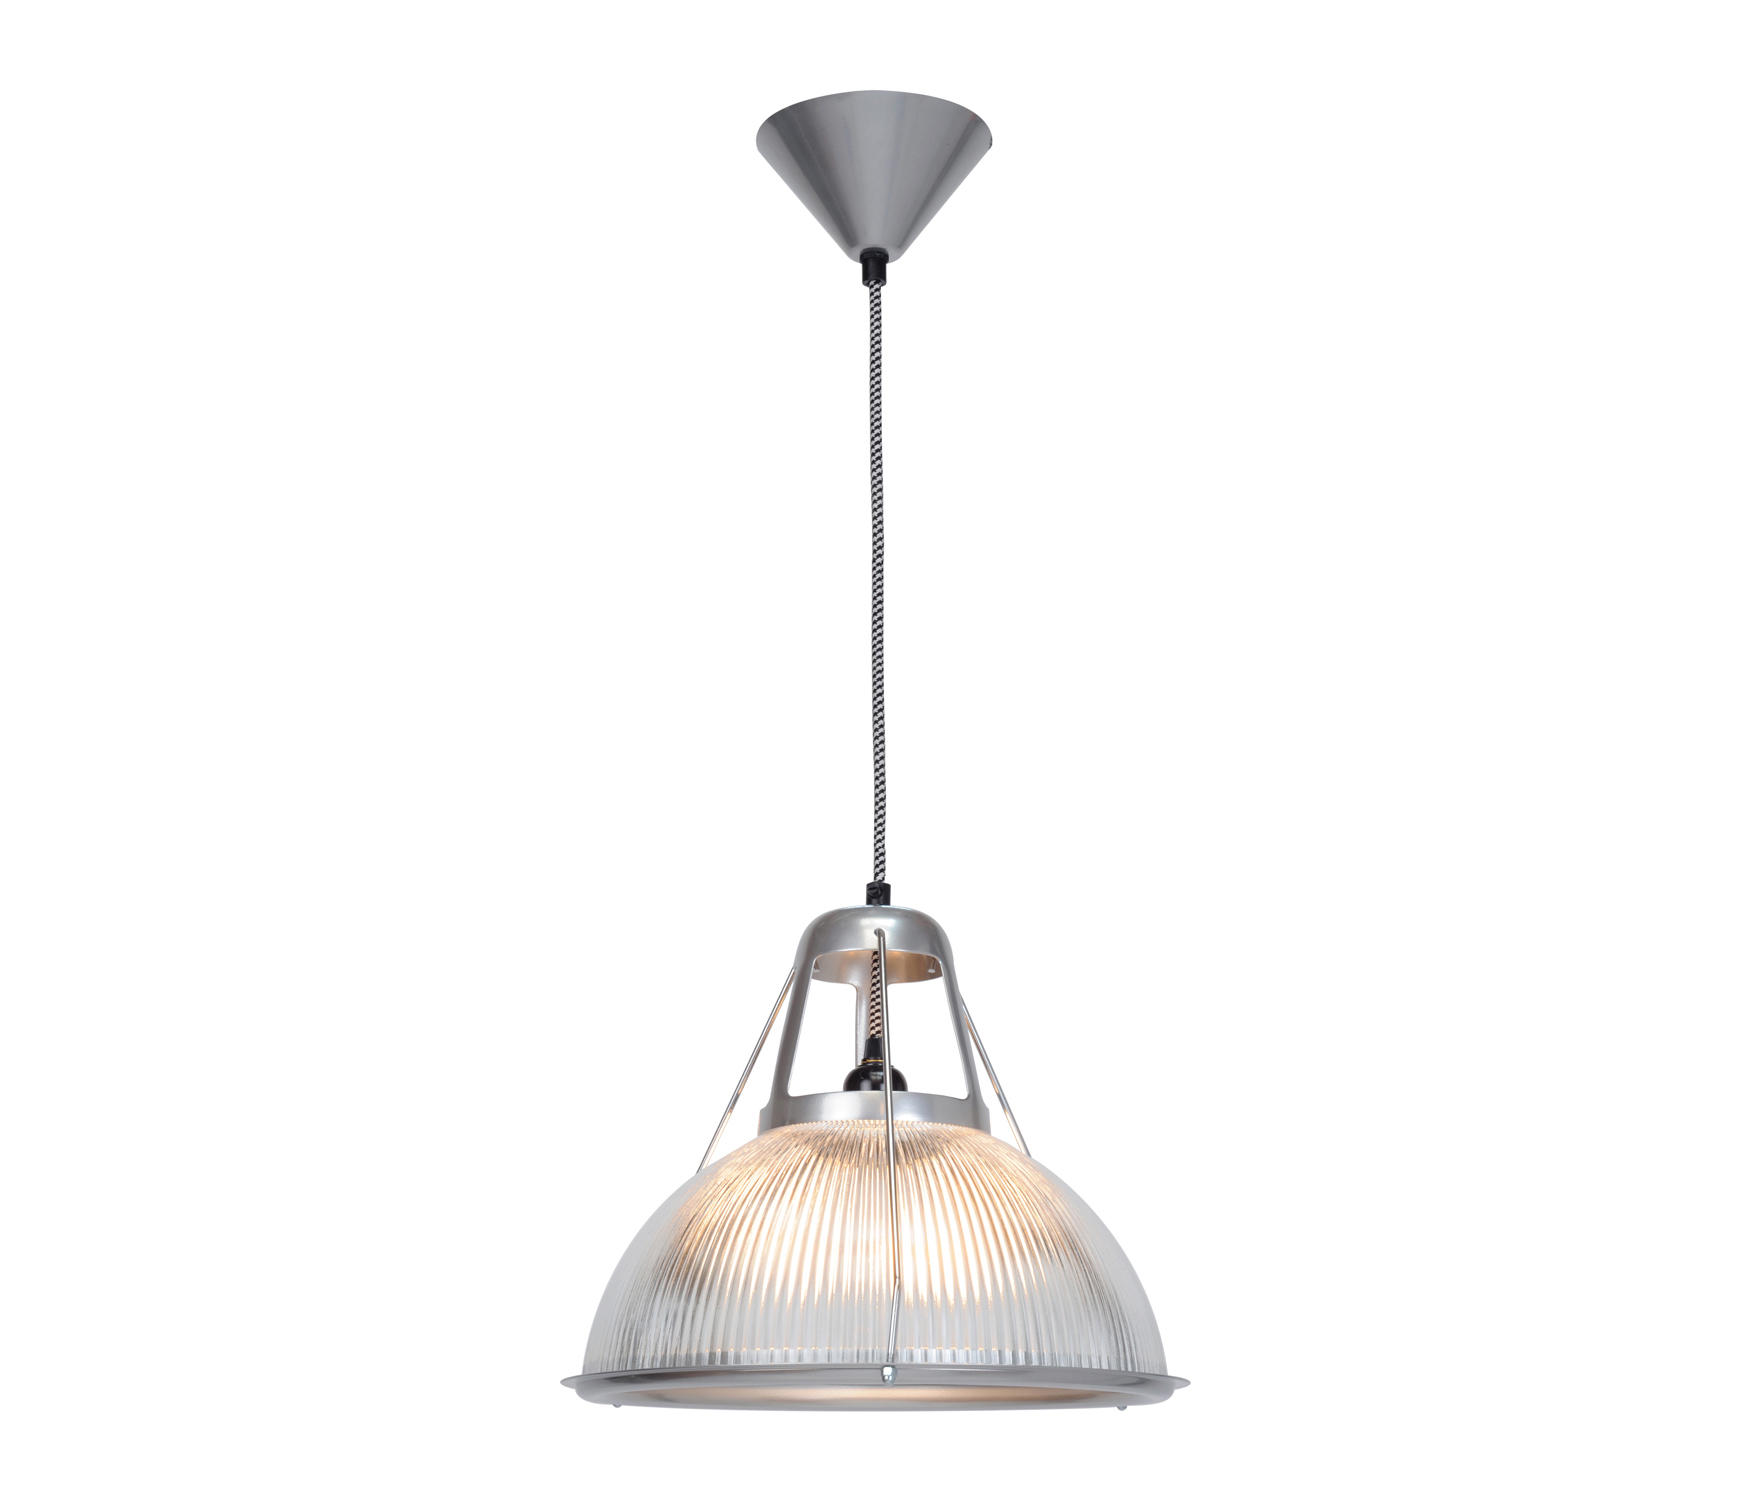 Phane prismatic glass pendant light general lighting from original phane prismatic glass pendant light by original btc general lighting arubaitofo Gallery